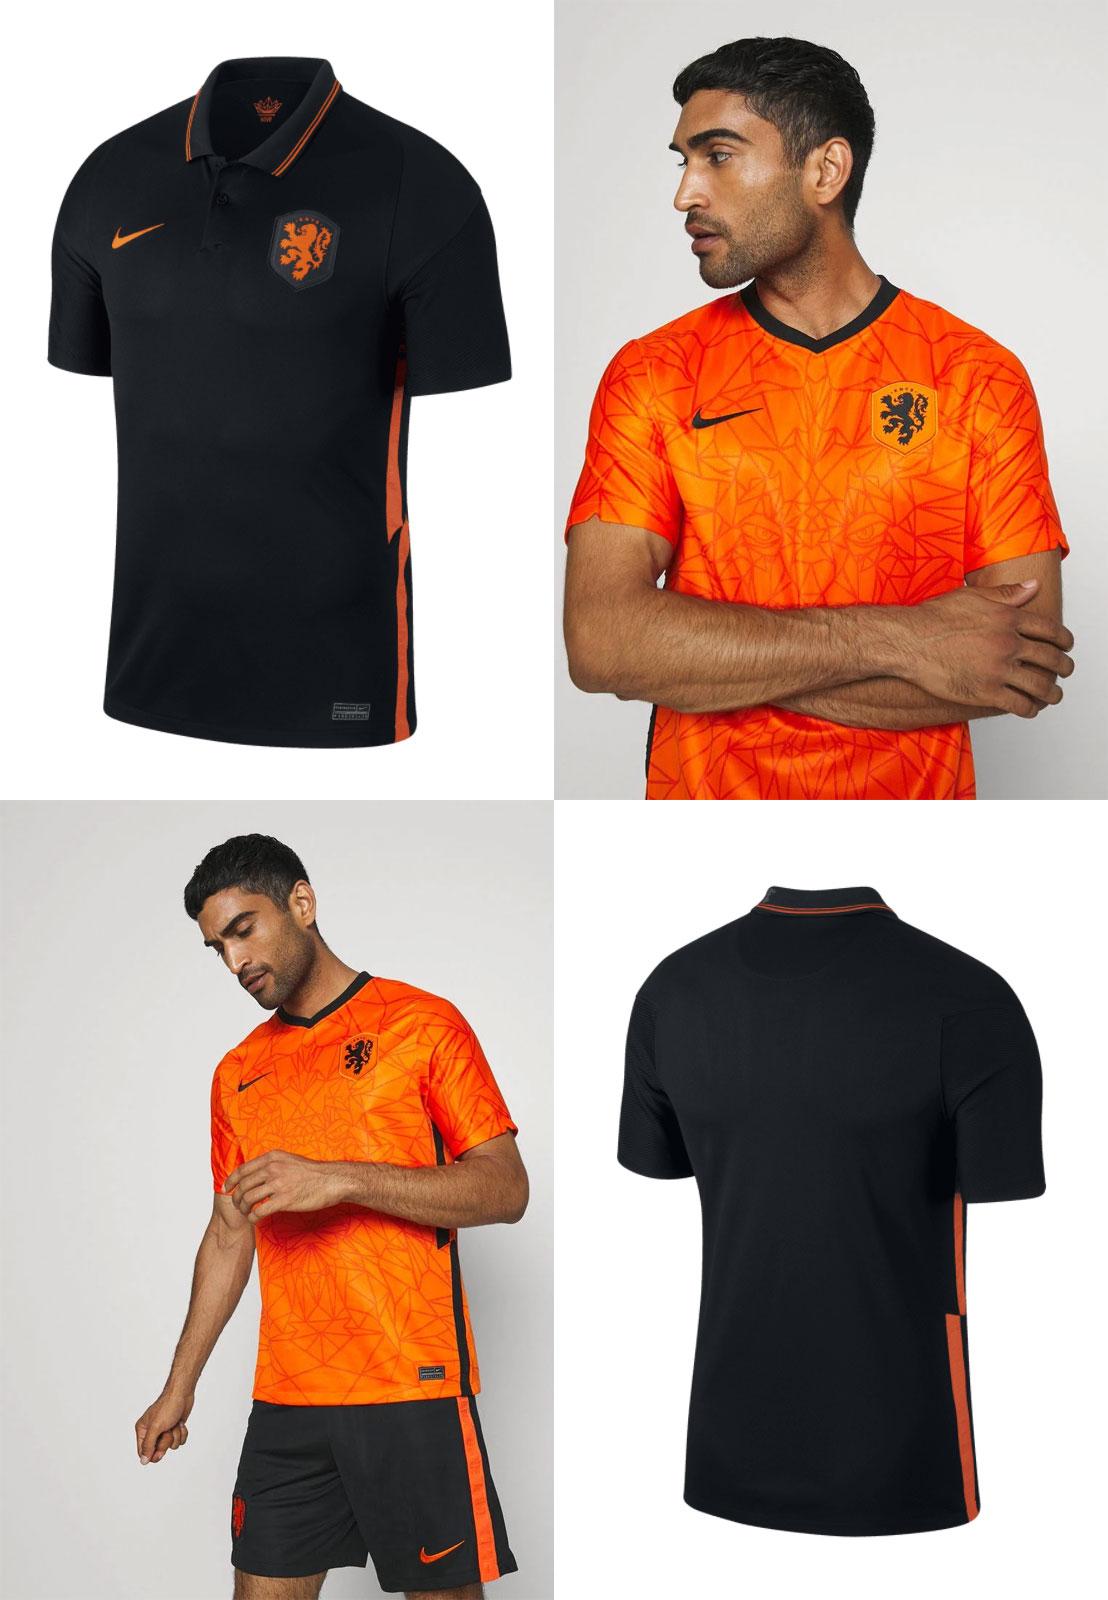 Nederland thuis / uit shirt EK 2020 [Nike] @ Geomix